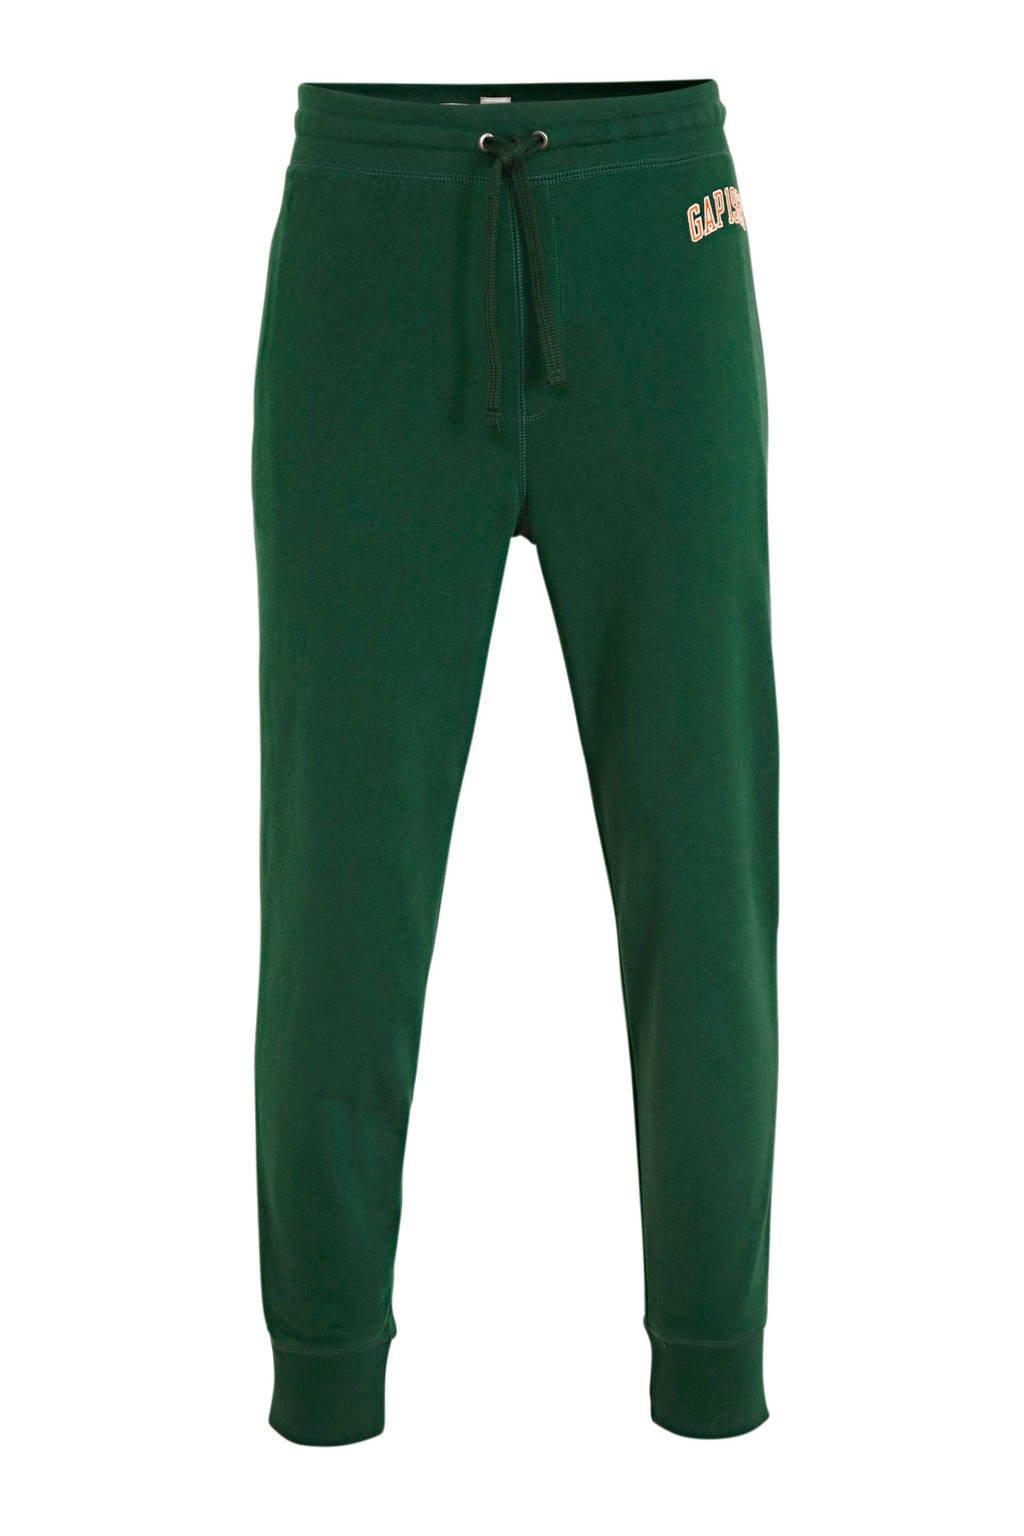 GAP straight fit joggingbroek met logo groen, Groen